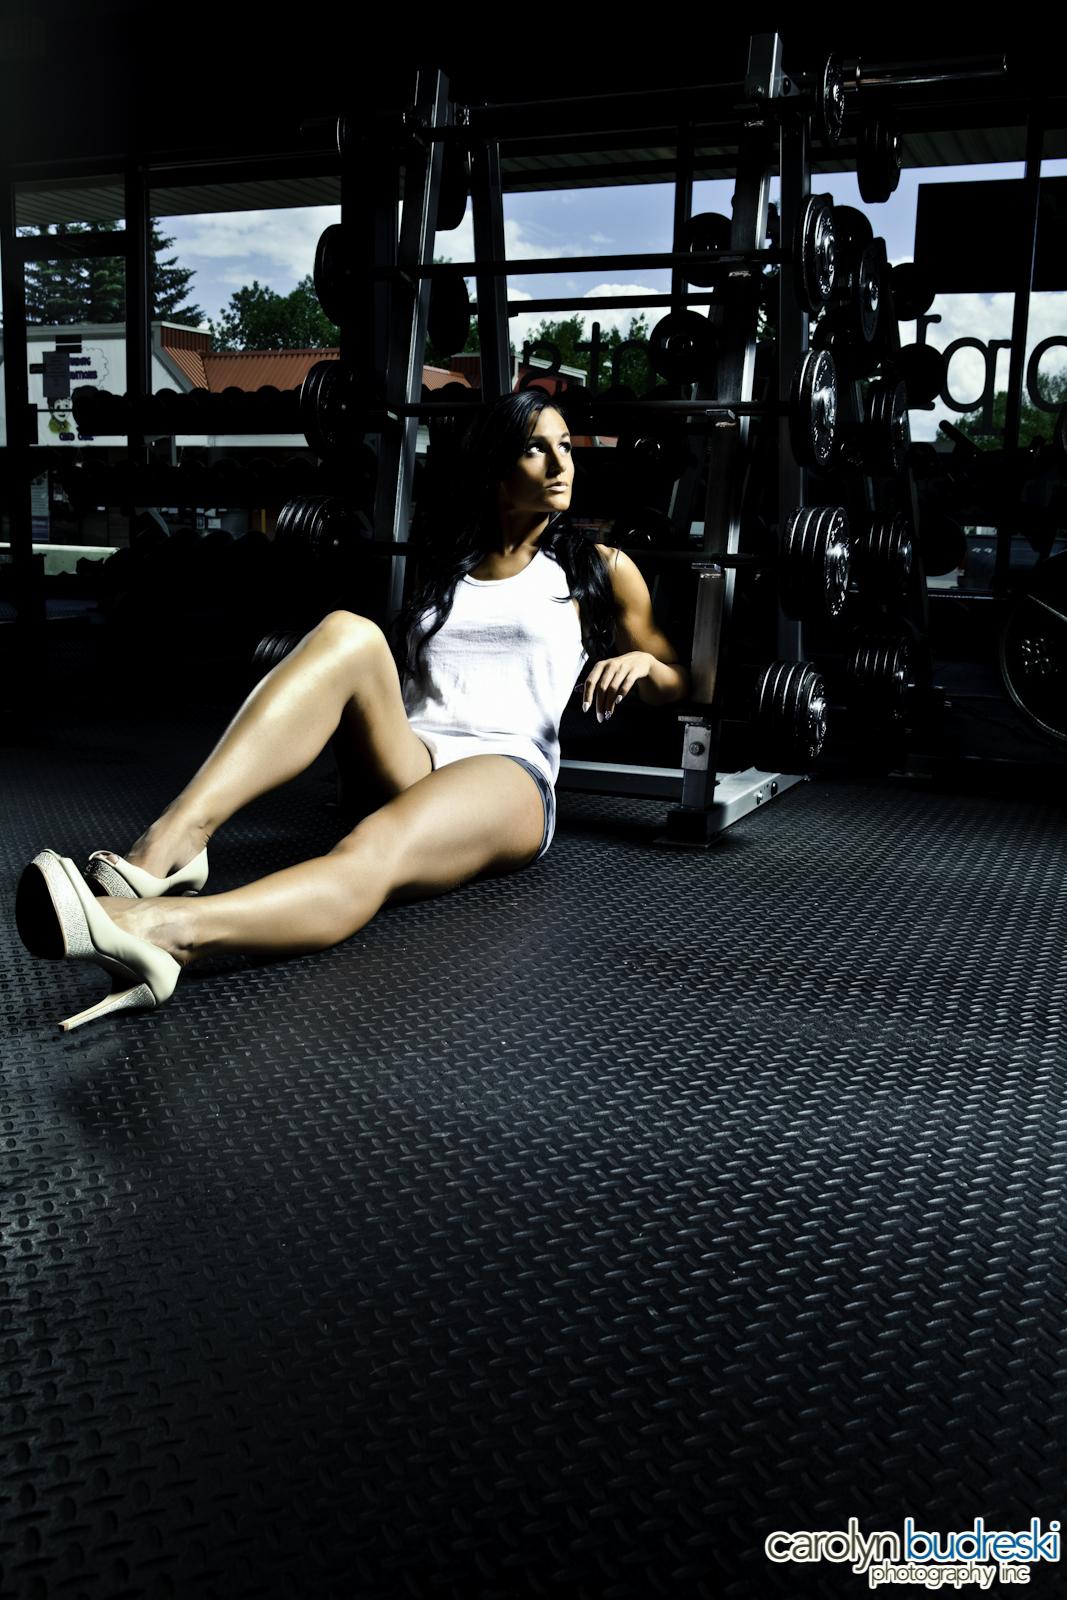 Calgary Fitness Photography